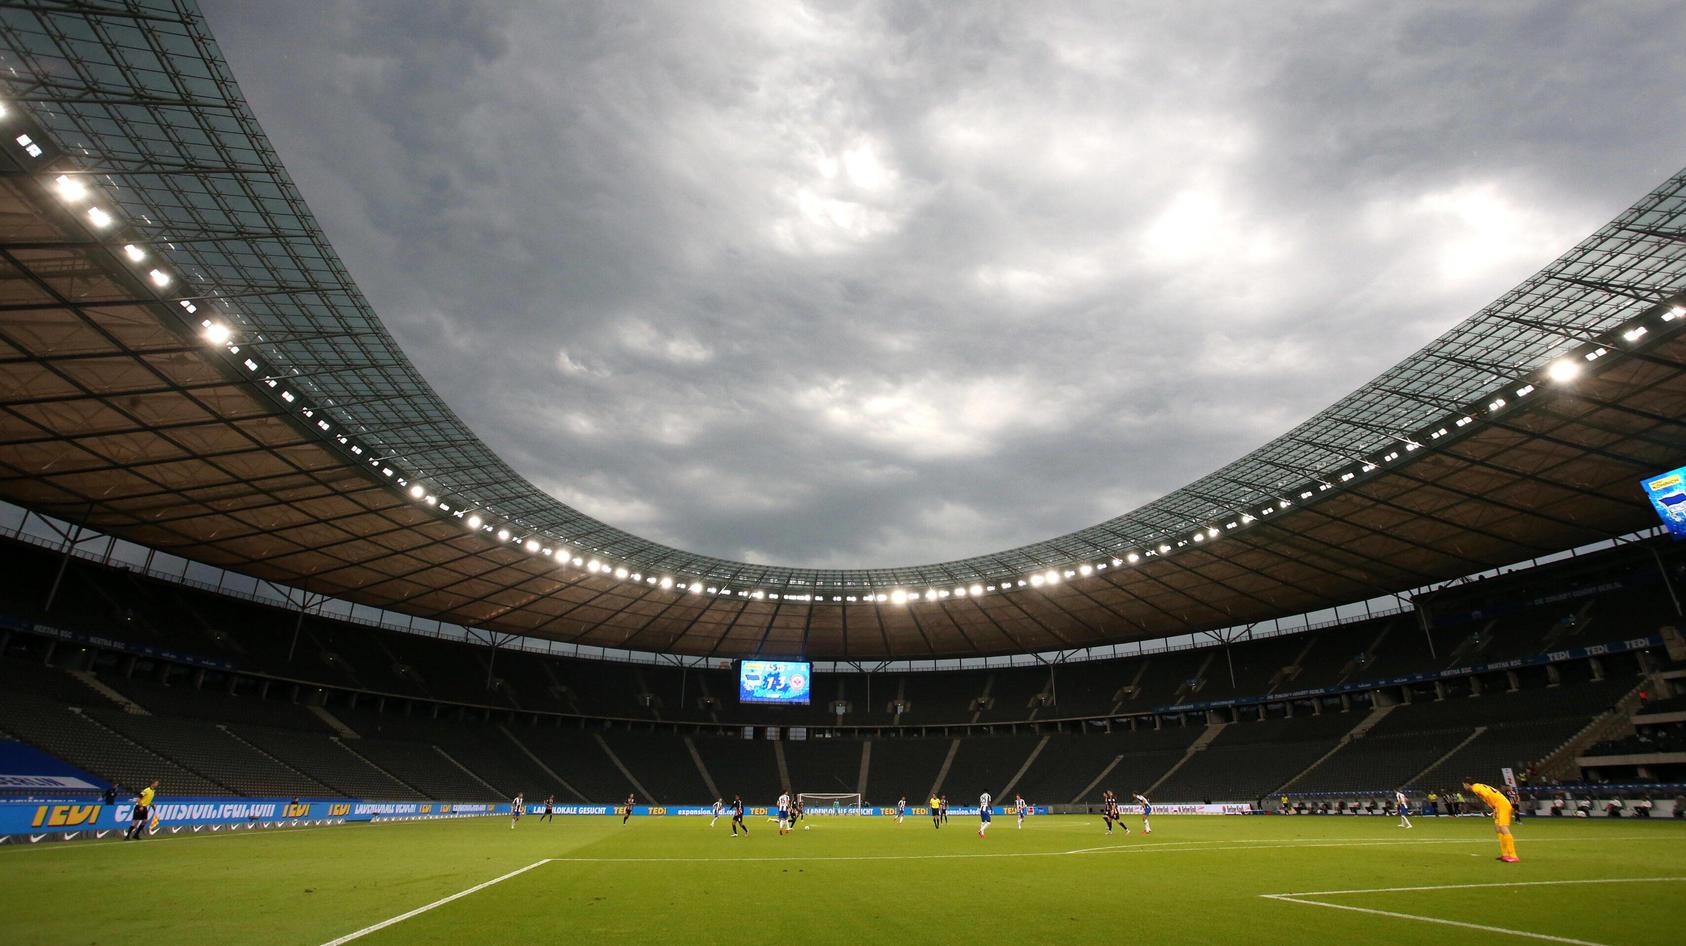 GER, DFL, 1.FBL, Hertha BSC vs. Eintracht Fankfurt / 13.06.2020, OLympiastadion, Berlin, GER, DFL, 1.FBL, Hertha BSC vs.